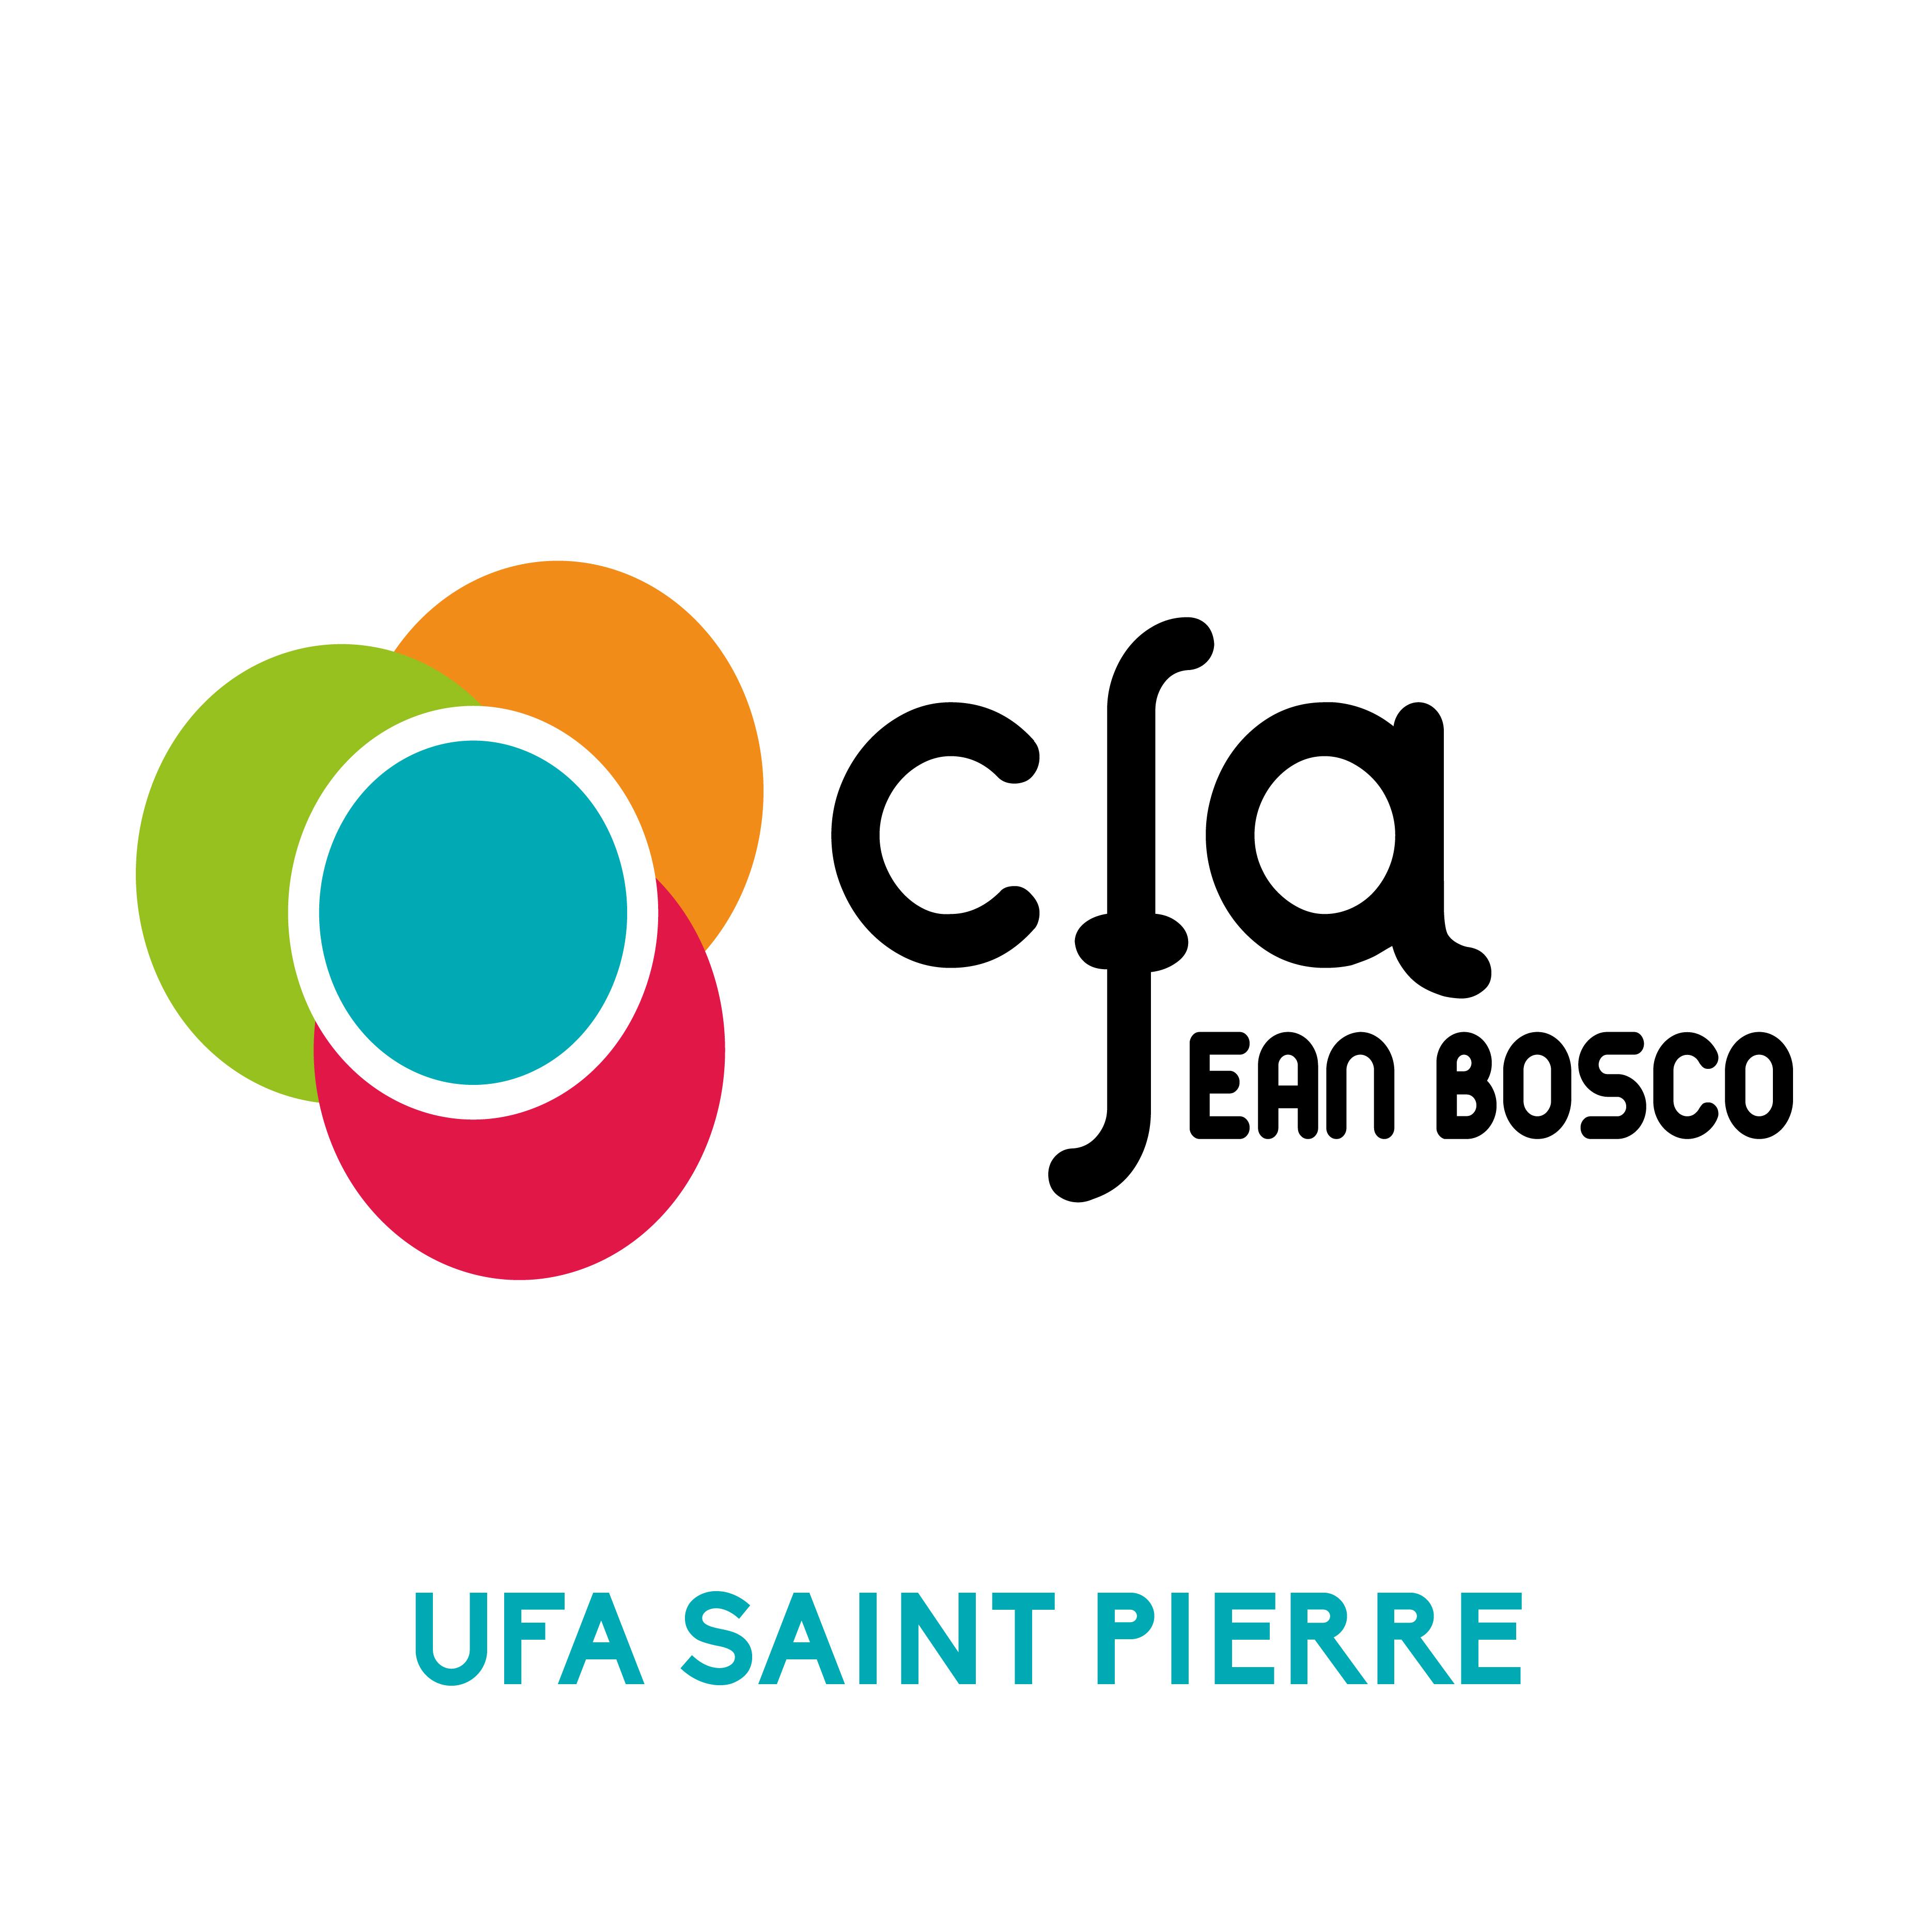 LOGO CFA-SAINT-PIERRE